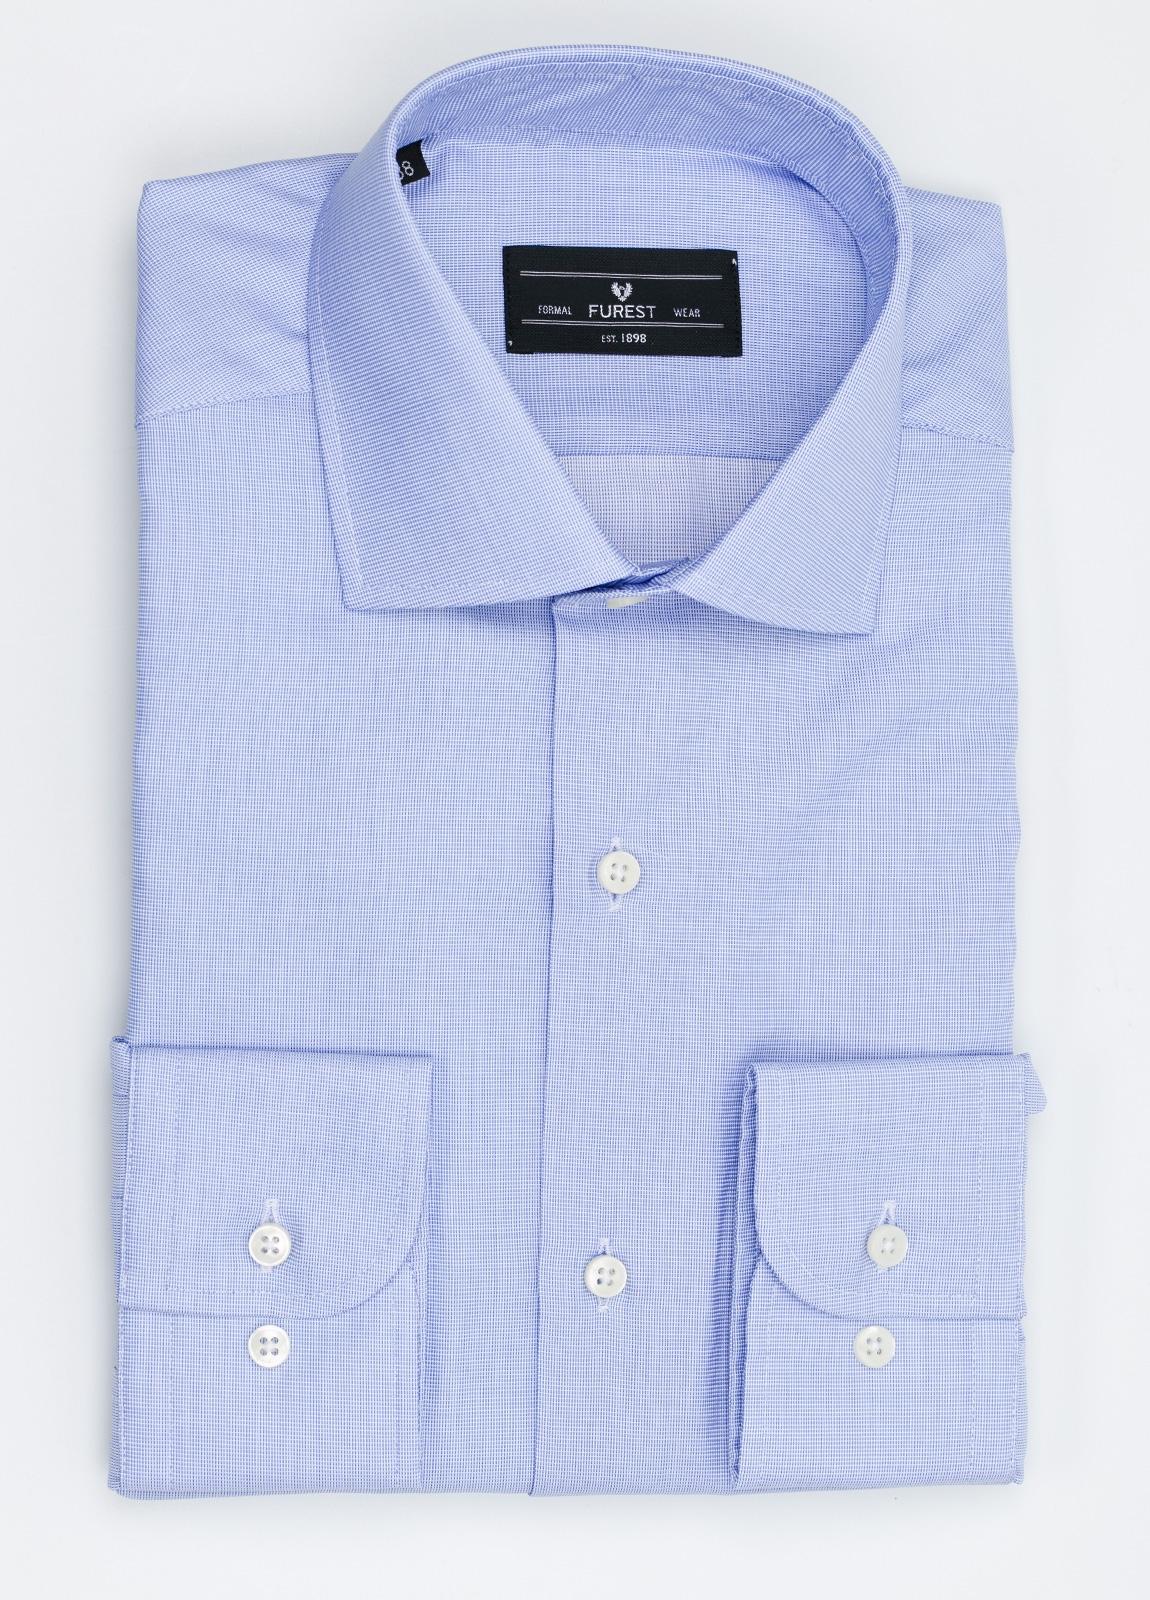 Camisa Formal Wear REGULAR FIT cuello italiano modelo TAILORED NAPOLI color azul, 100% Algodón.